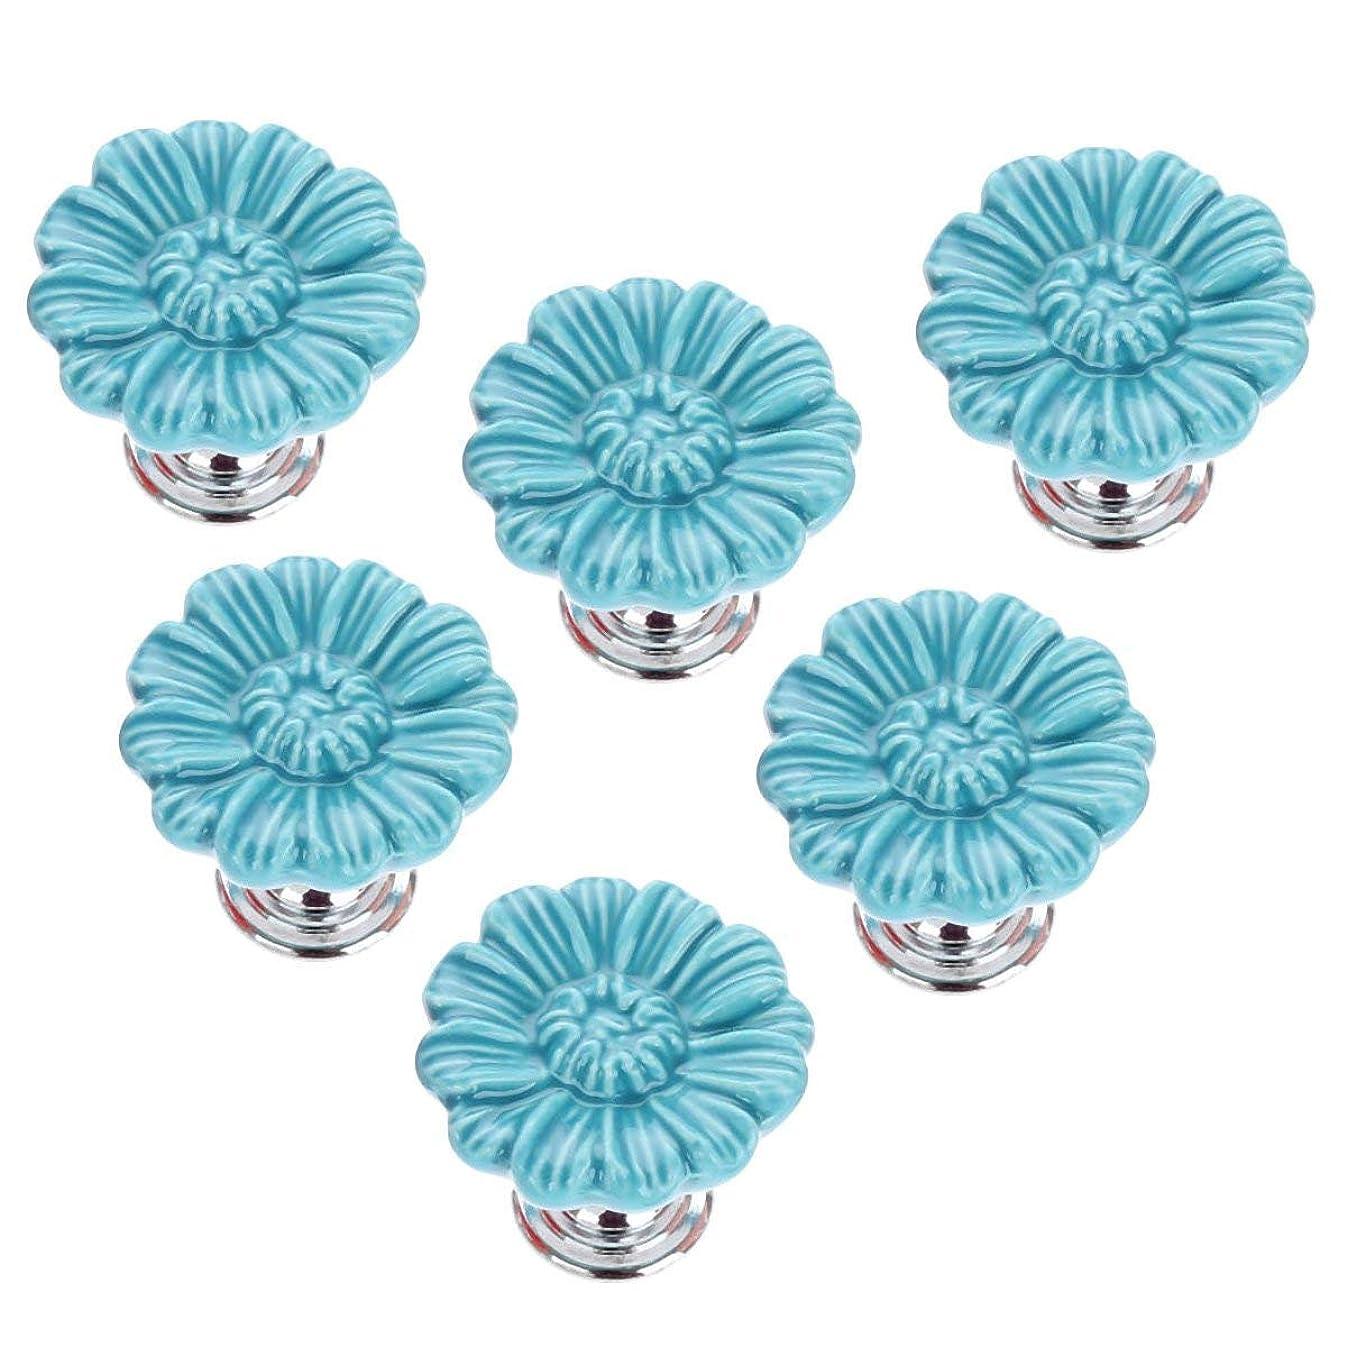 Joyindecor Daisy Flower Drawer Pulls Handles for Baby Nursery Kids Room Cupboard Wardrobe Cabinet, Handmade Cute Decorative Ceramic Dresser Knobs with 3 Size Mounting Screws, 6 Pack (Blue)